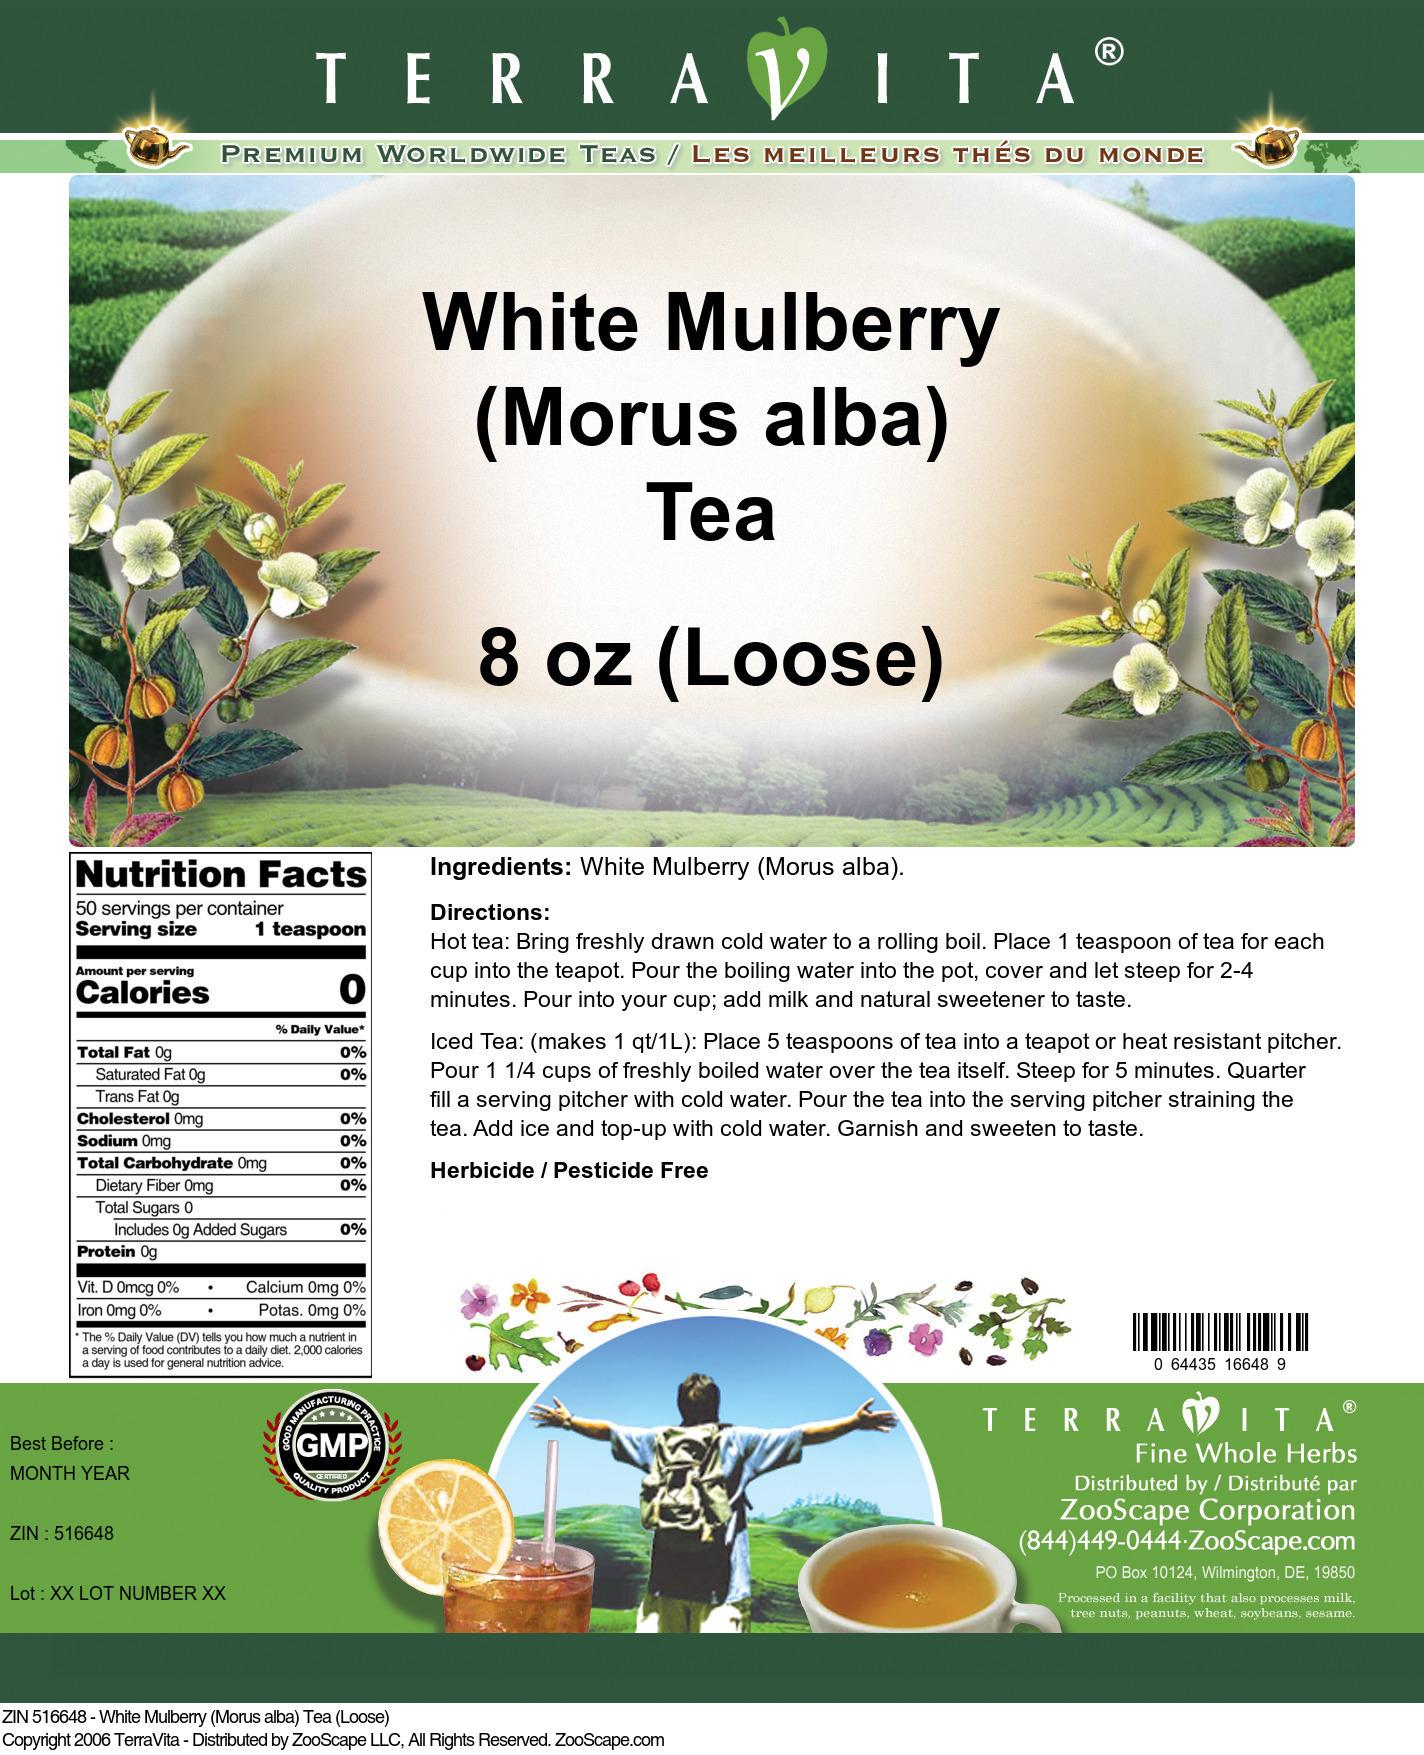 White Mulberry (Morus alba) Tea (Loose)